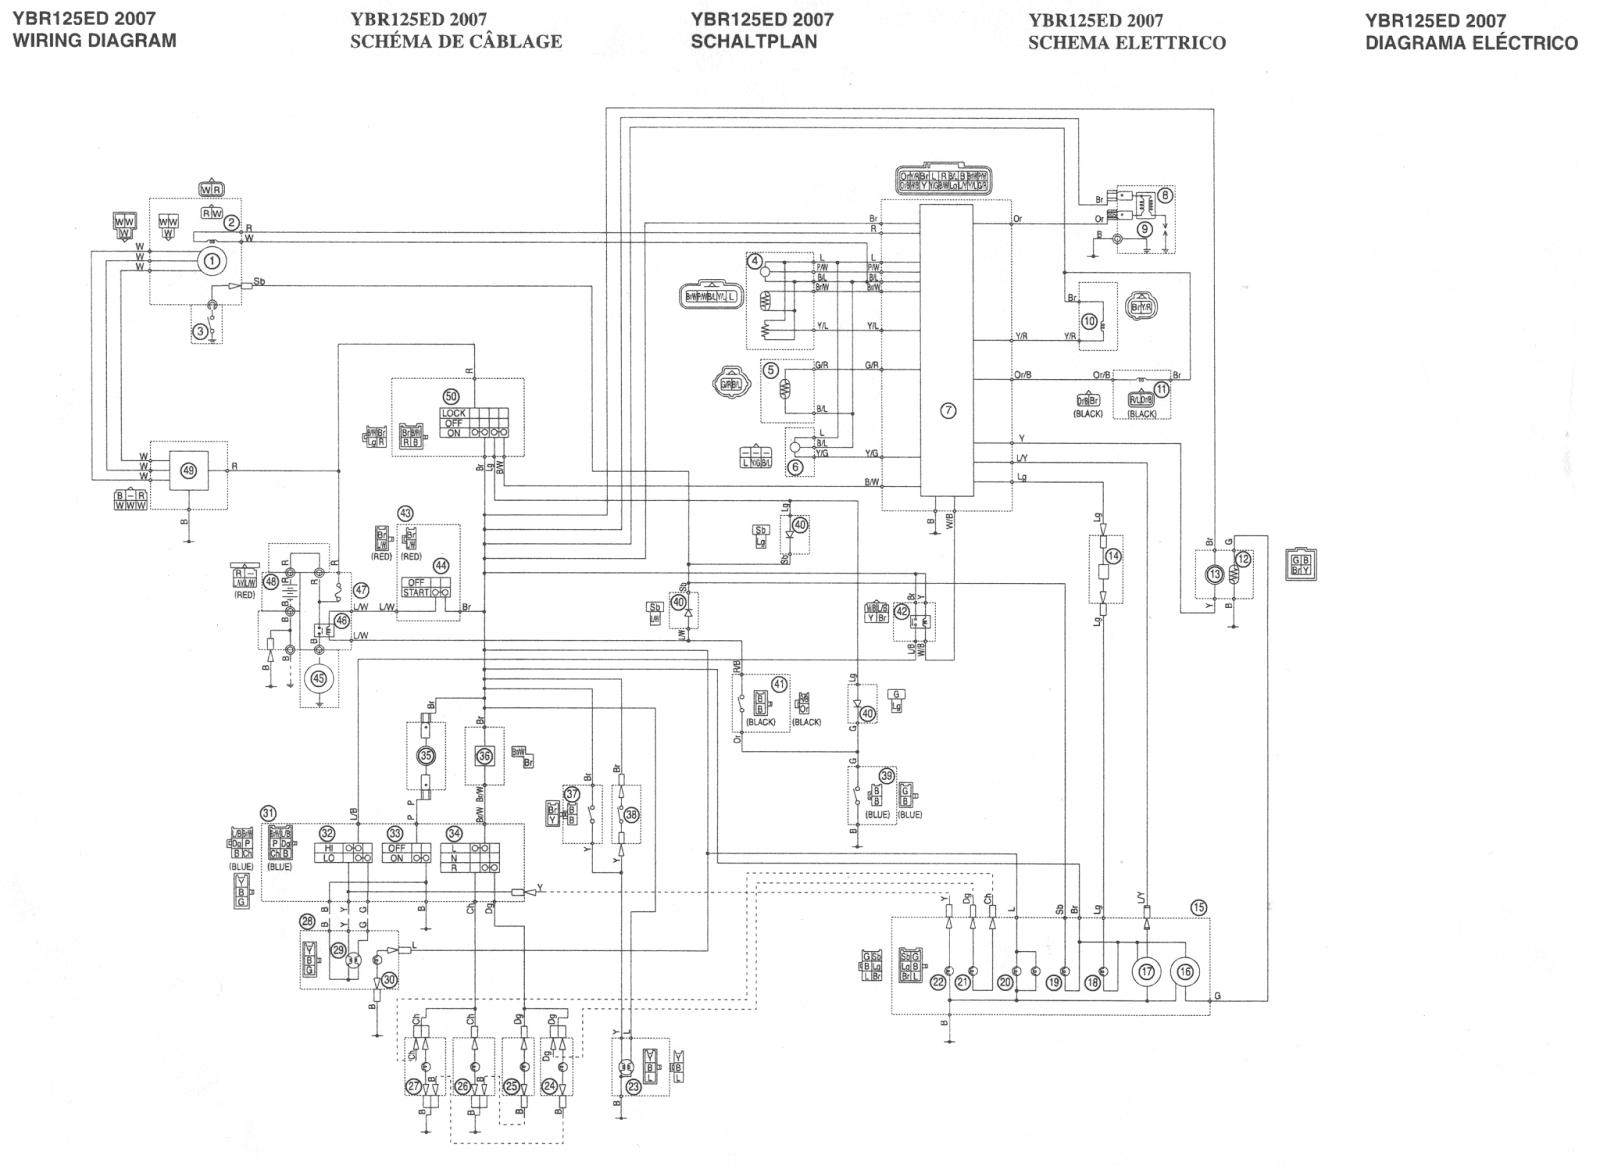 small resolution of  schema yamaha ybr 125 owner blog yamaha ybr 125 electrical system yamaha virago 250 wiring diagram